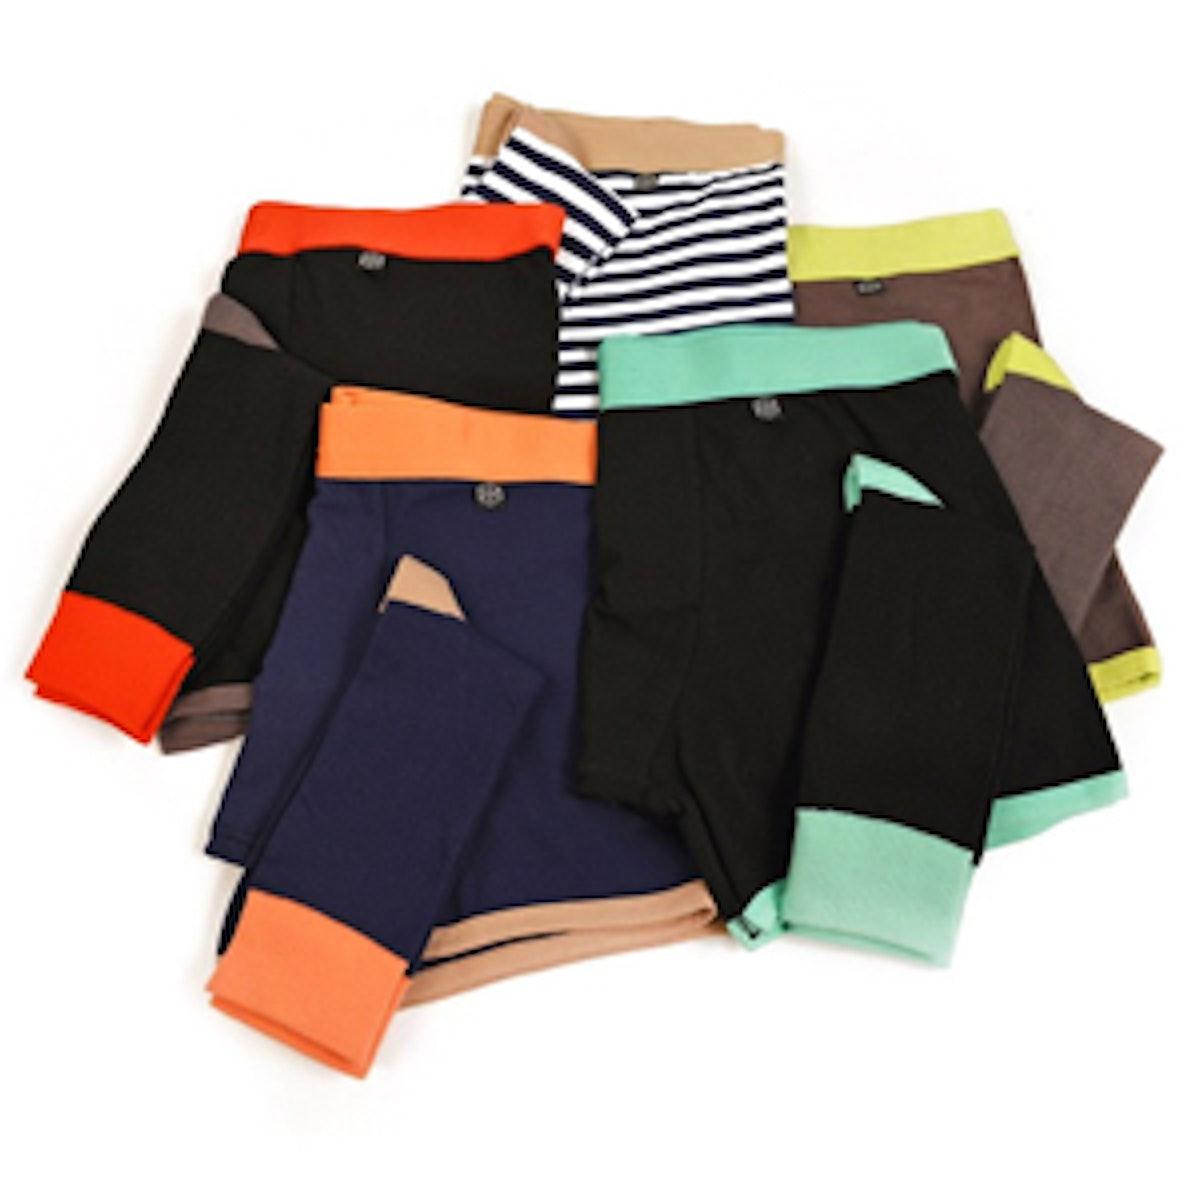 Coordinated Sock & Underwear Set